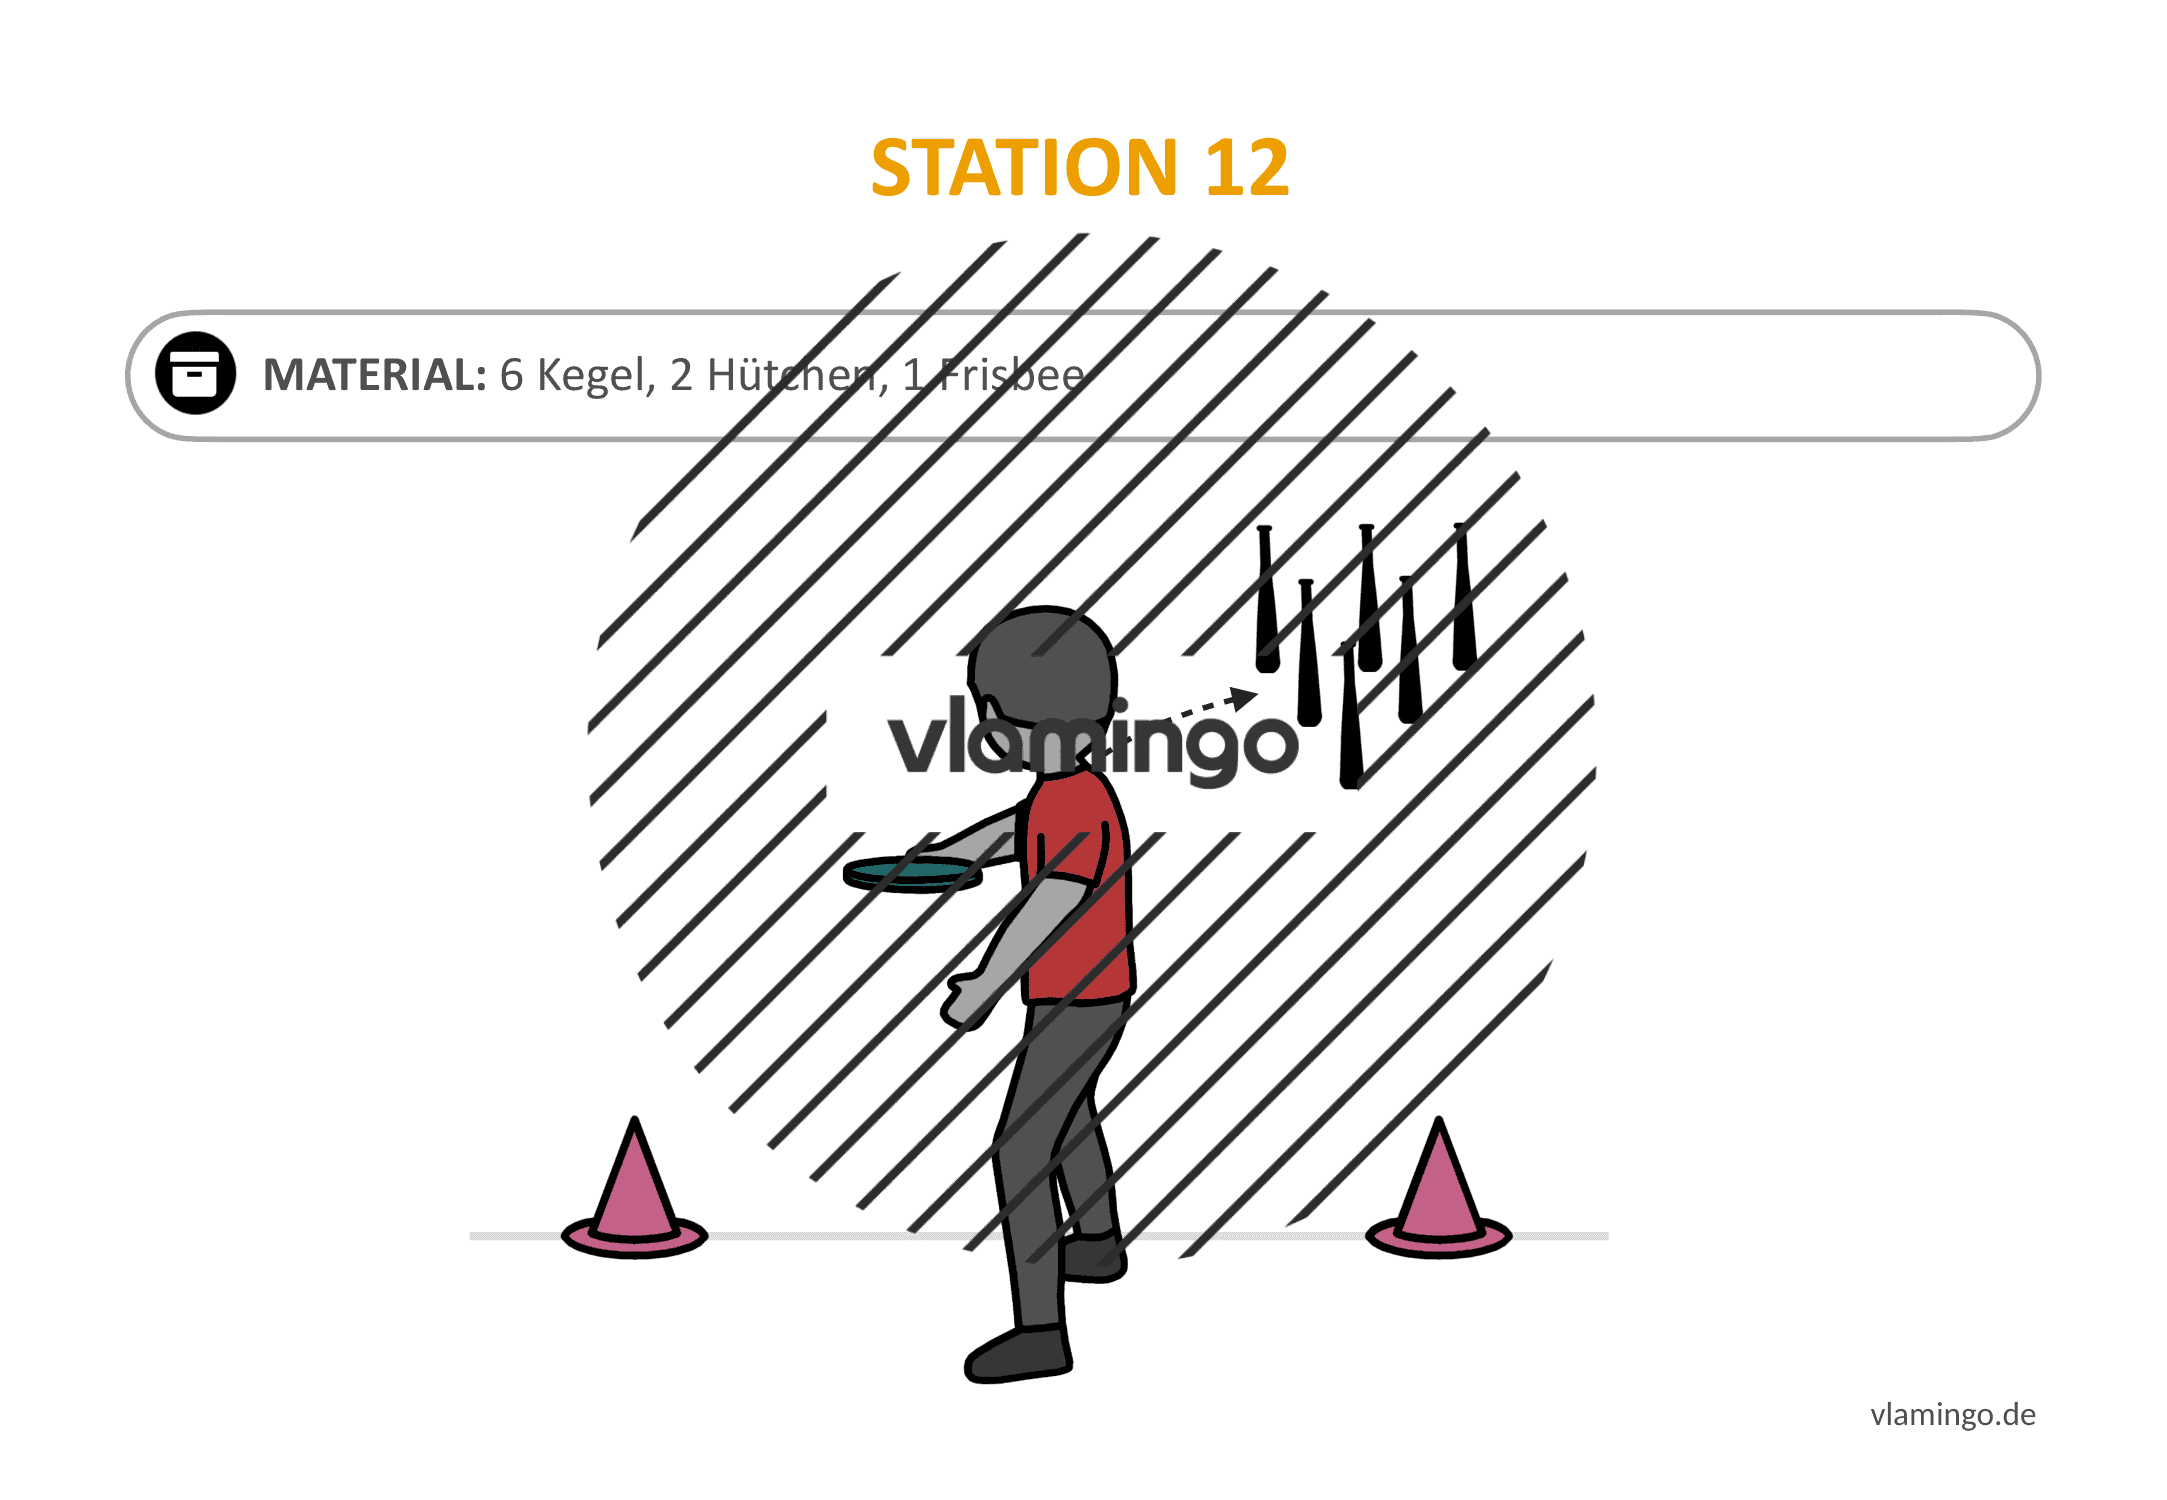 Frisbeegolf (Disc-Golf) - Station 12